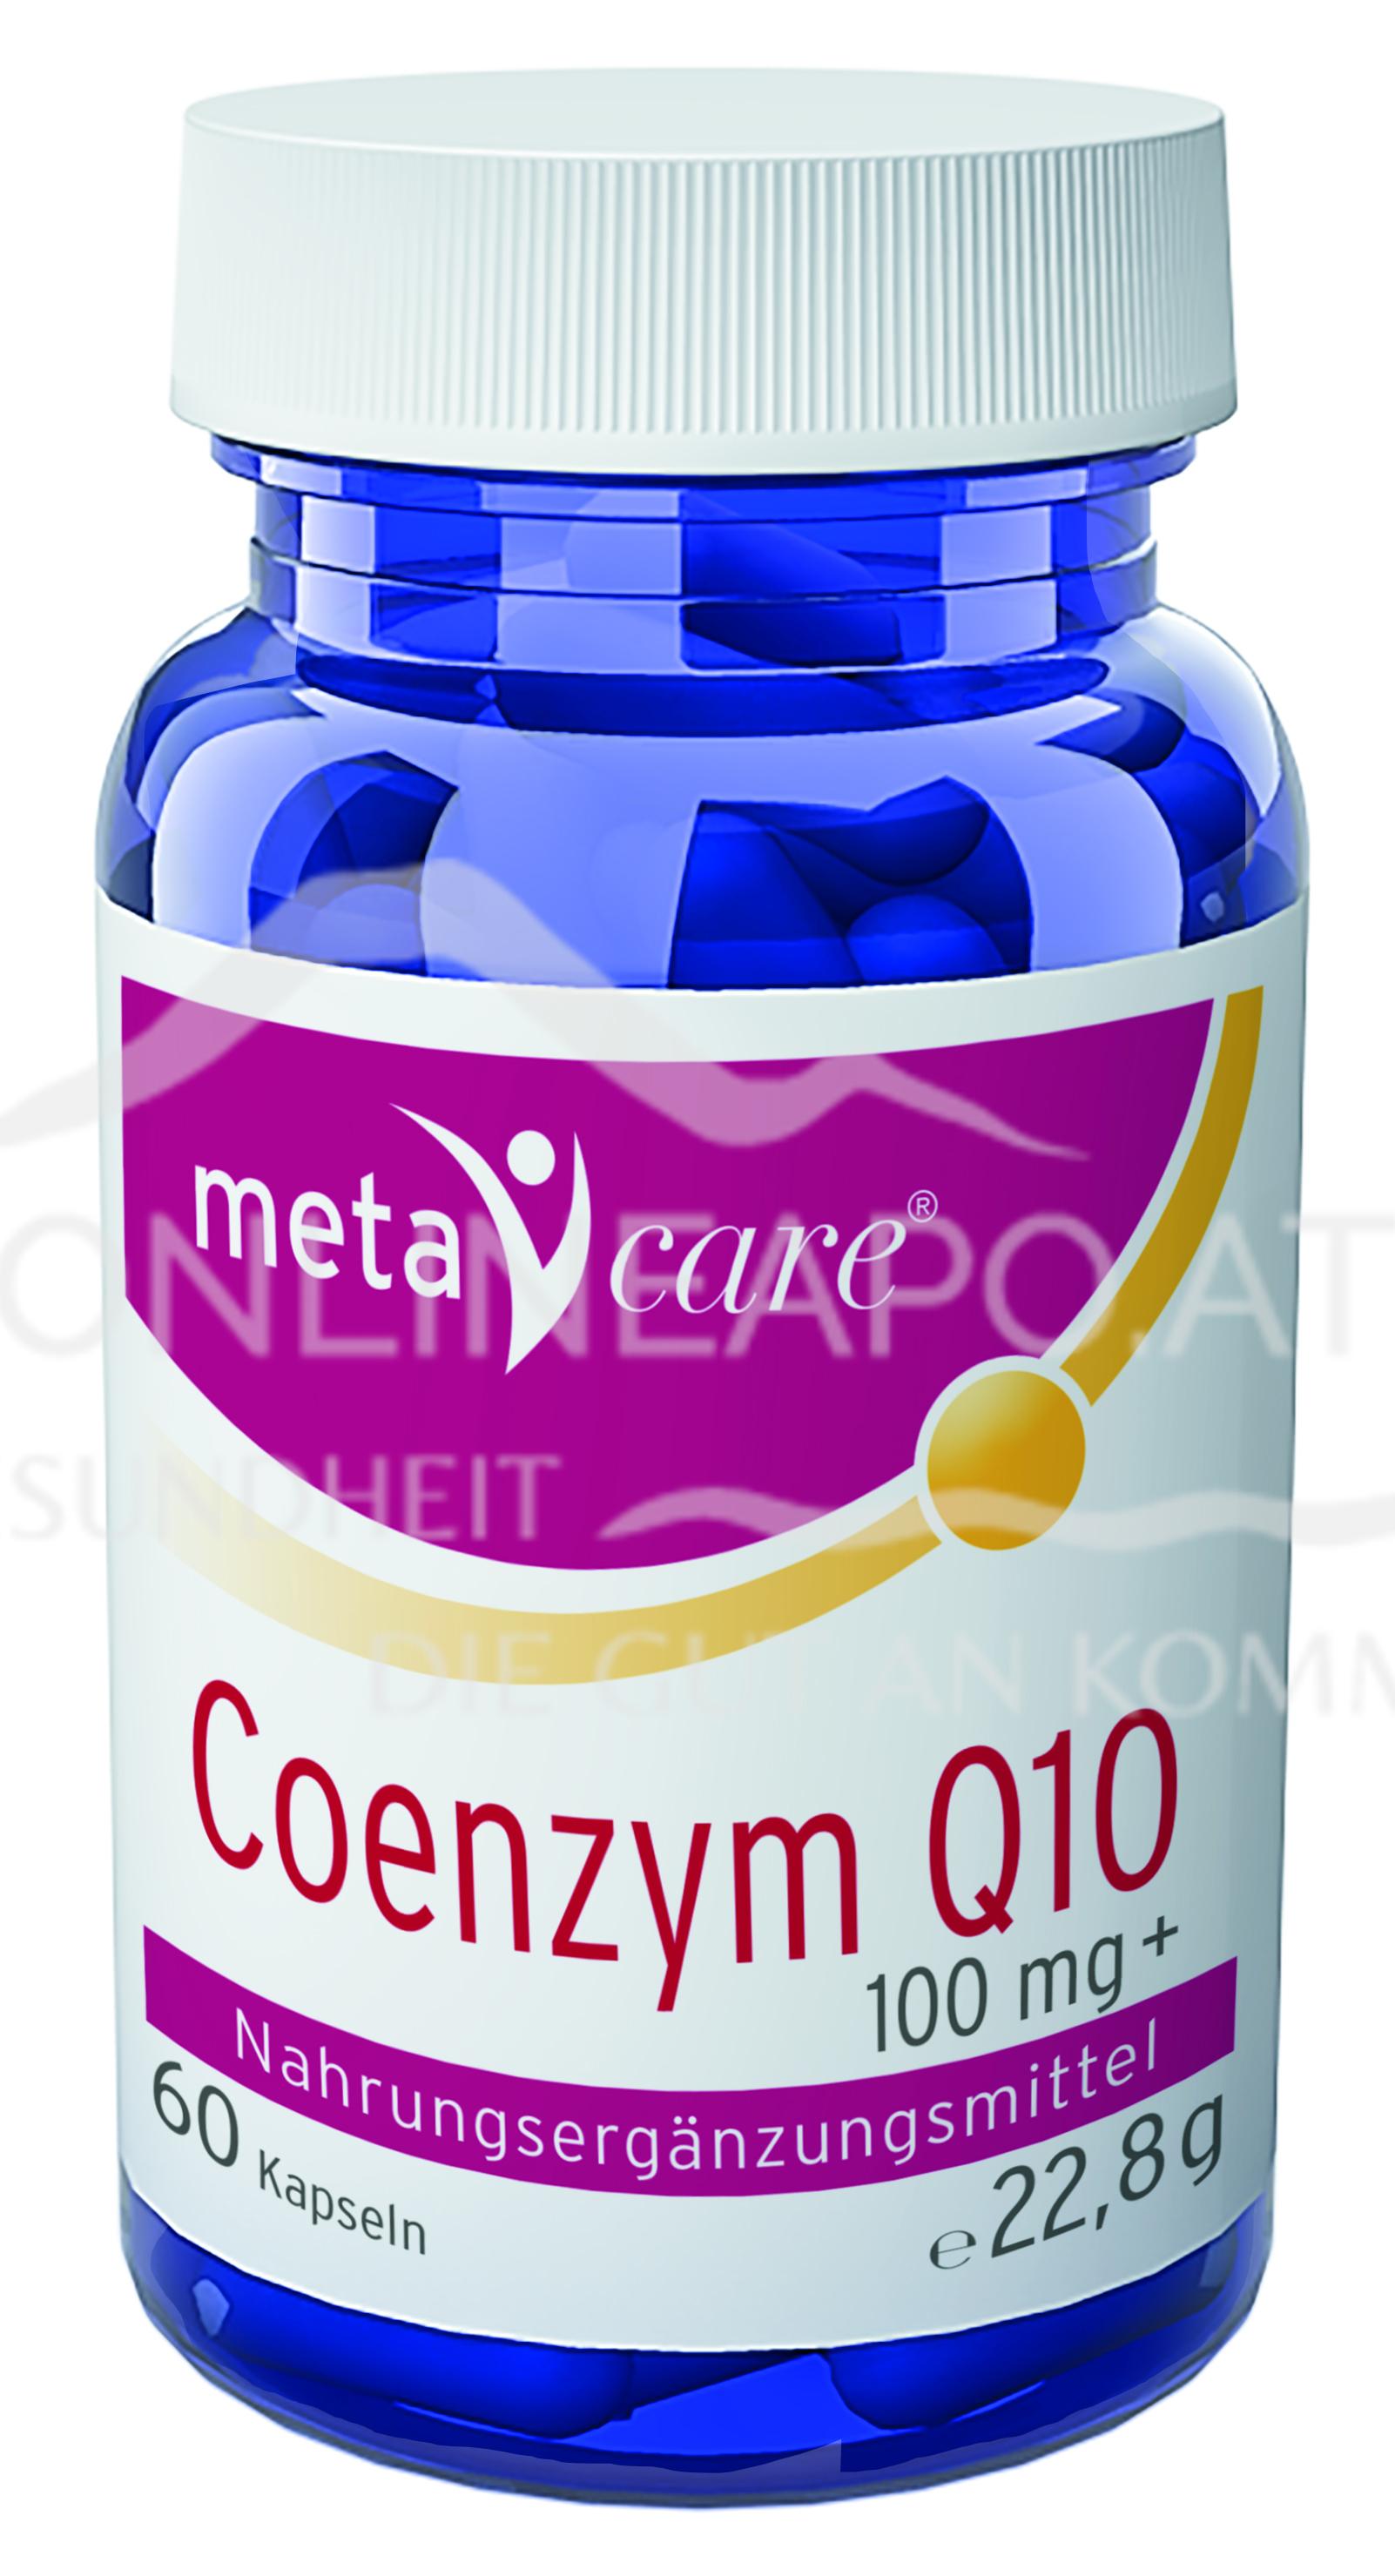 metacare® Coenzym Q10